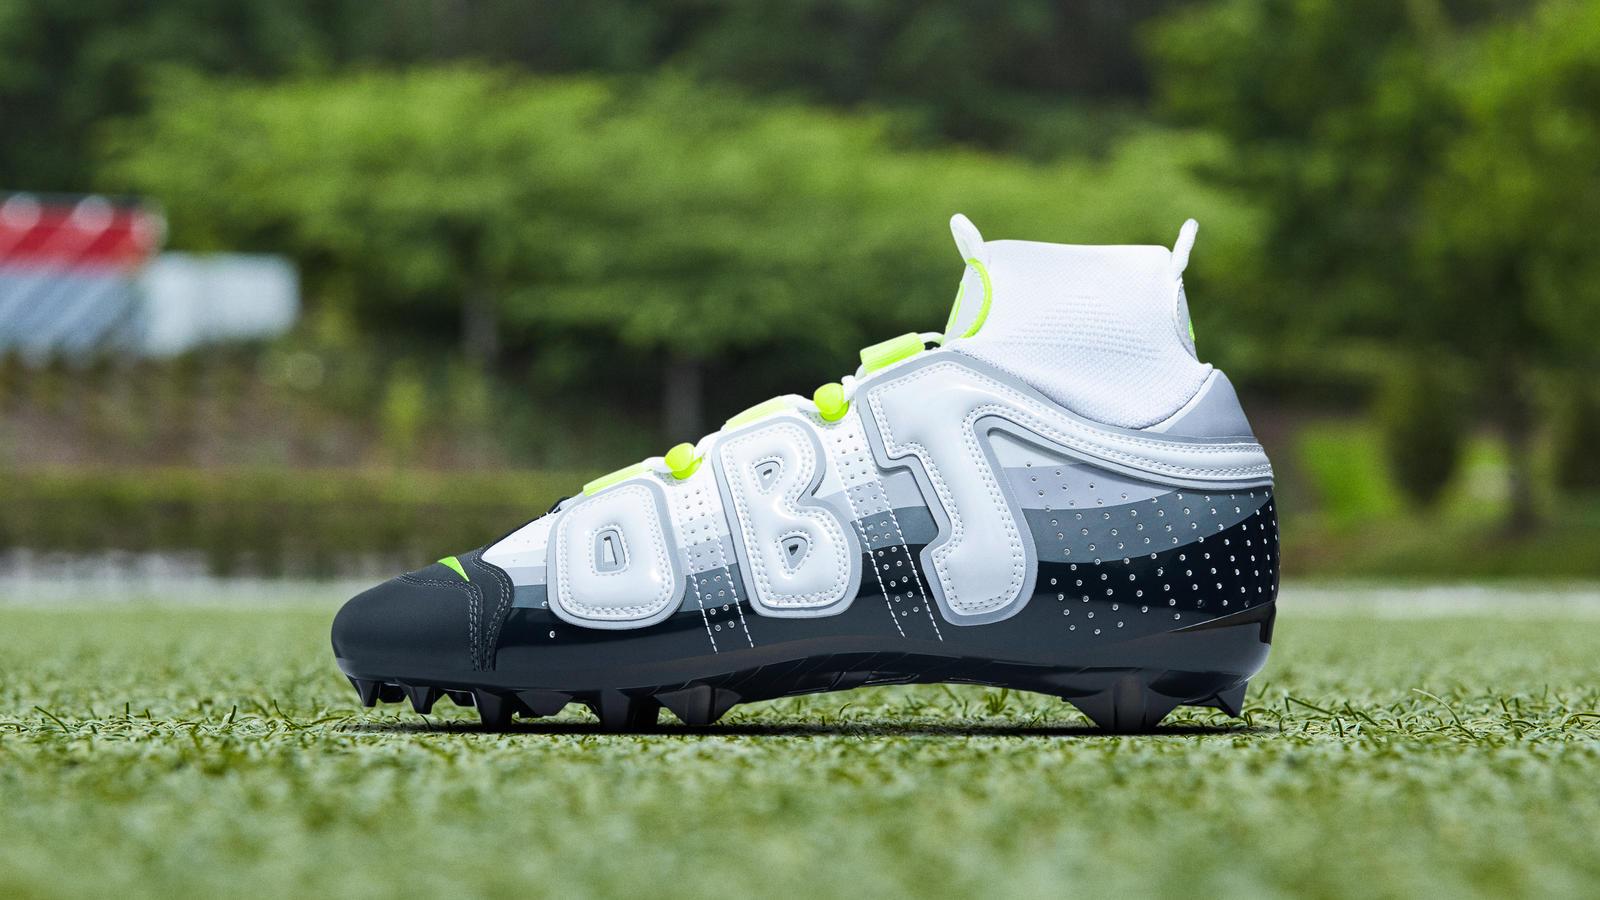 95 Max Cleat News Air Obj Nike mNO0vw8n